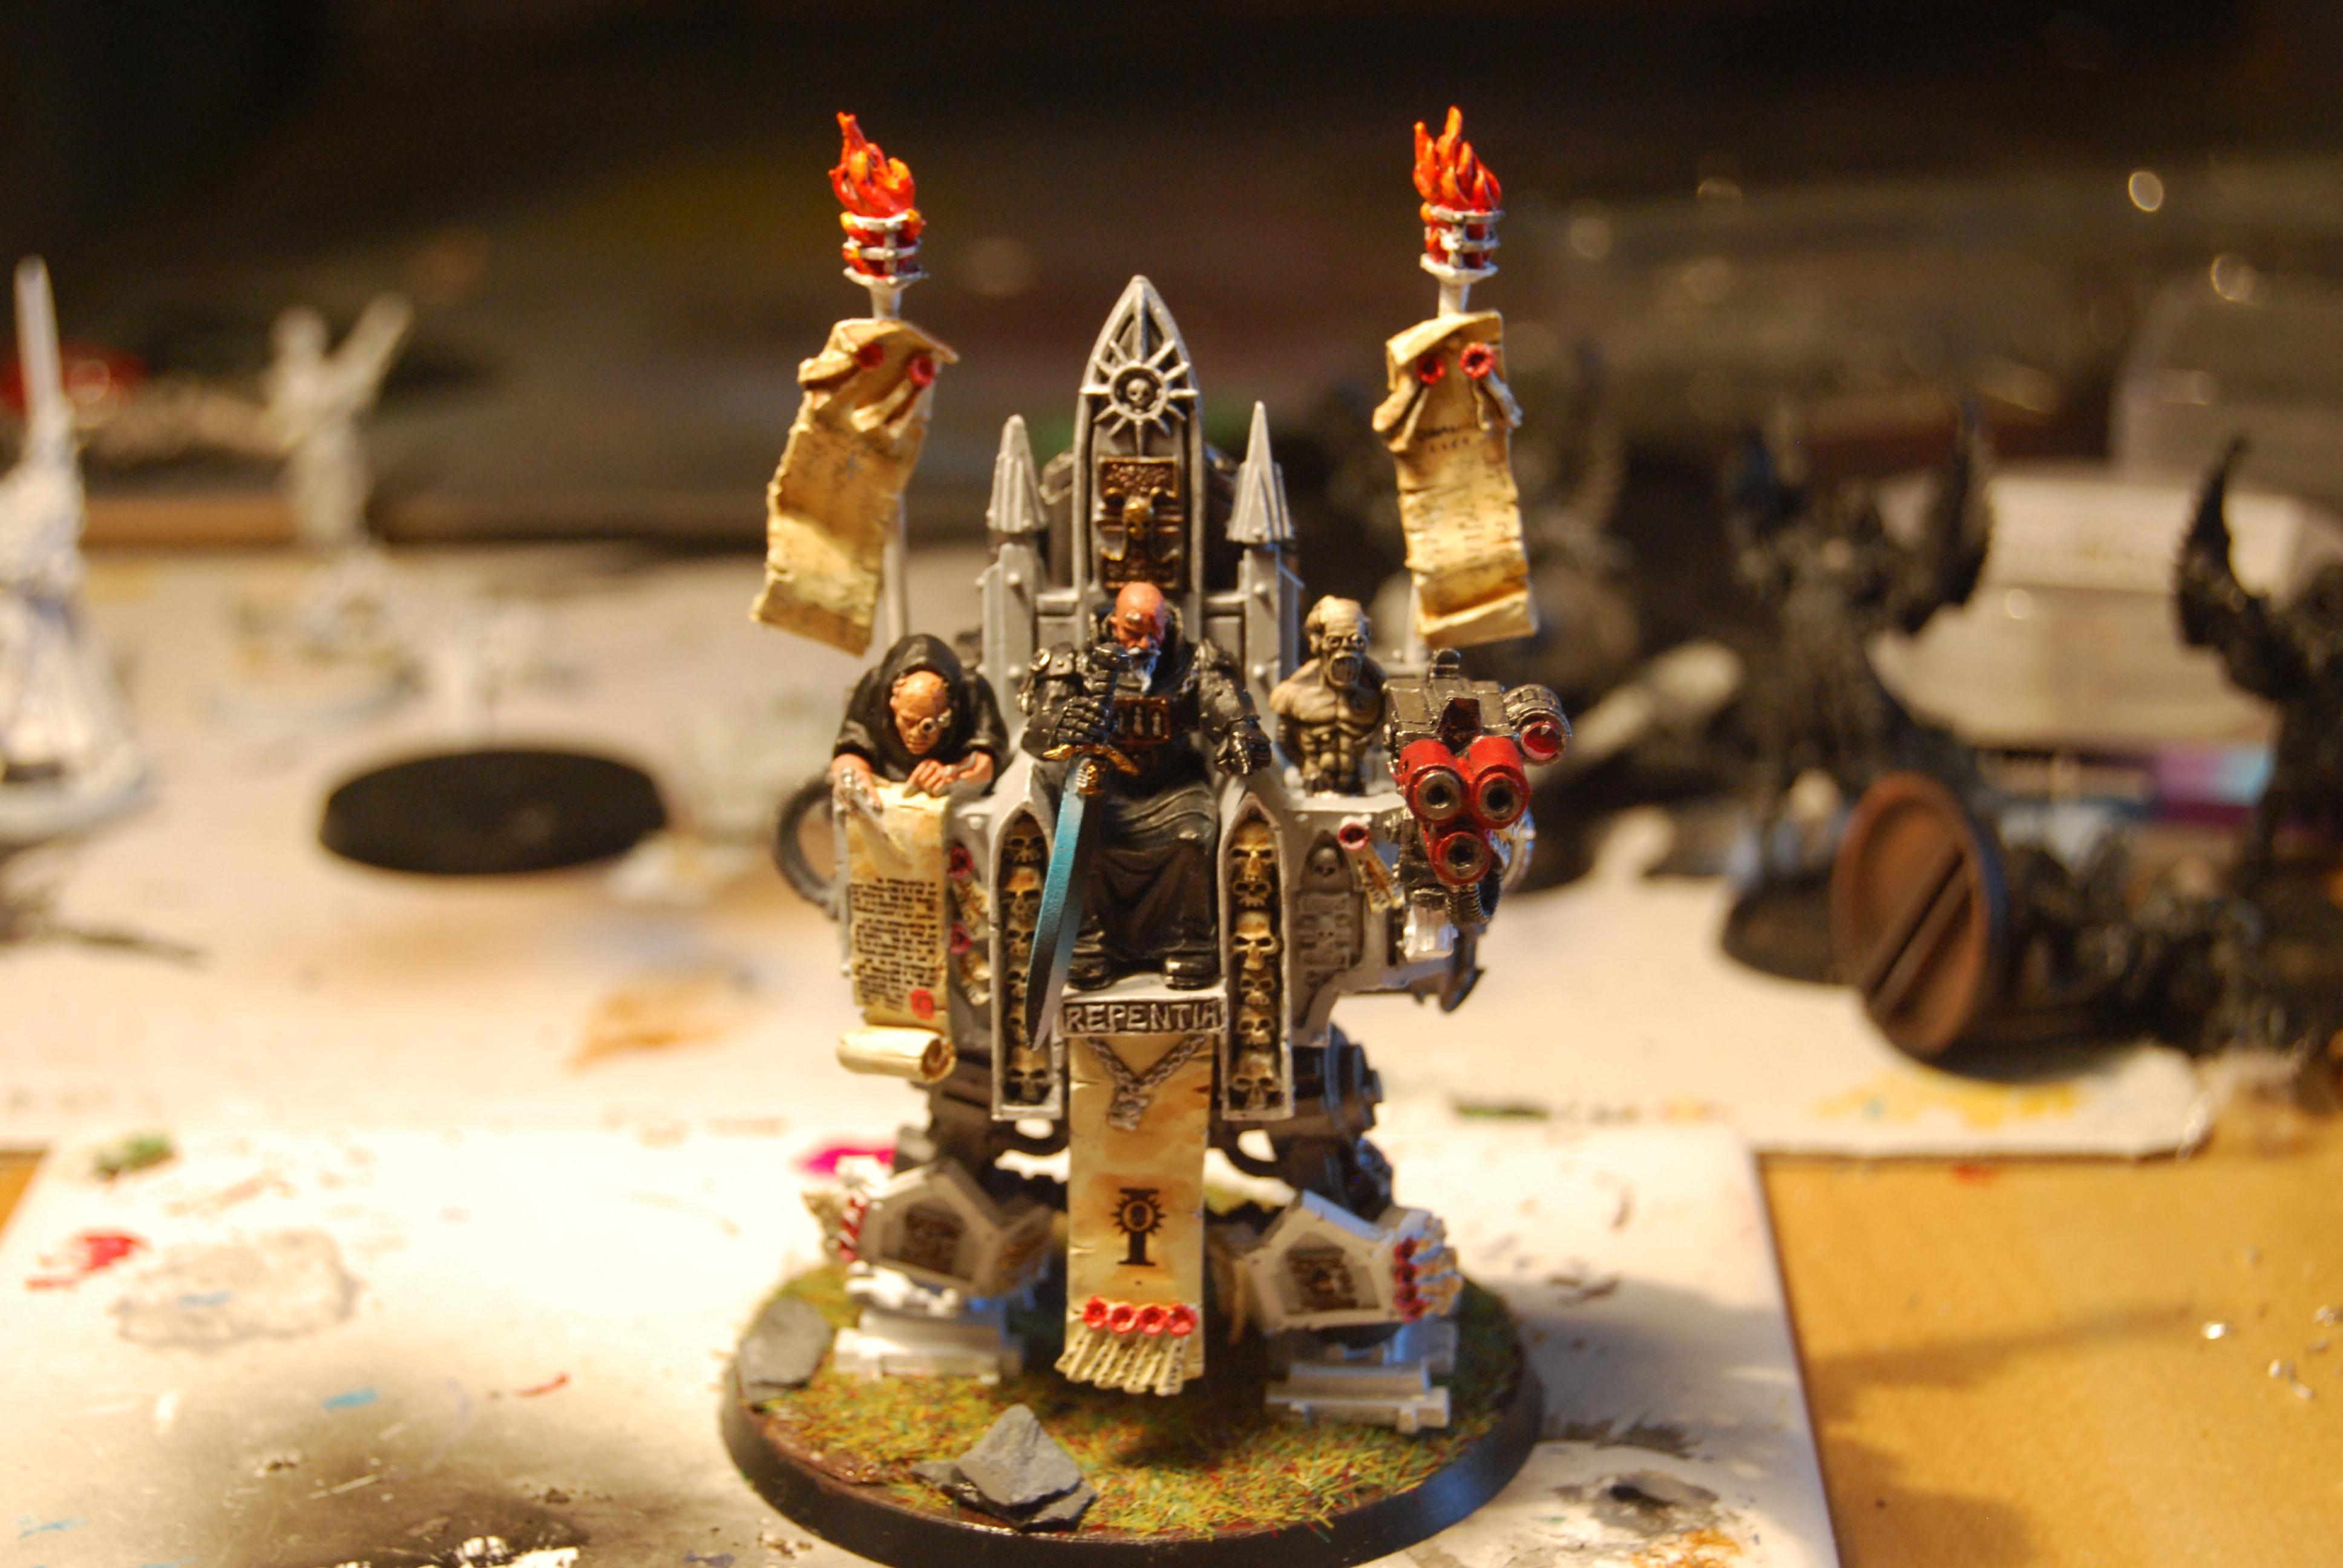 Daemonhunter, Grey Knights, Inquisitor, Inquisitor Karamazov, Sisters Of Battle, Warhammer 40,000